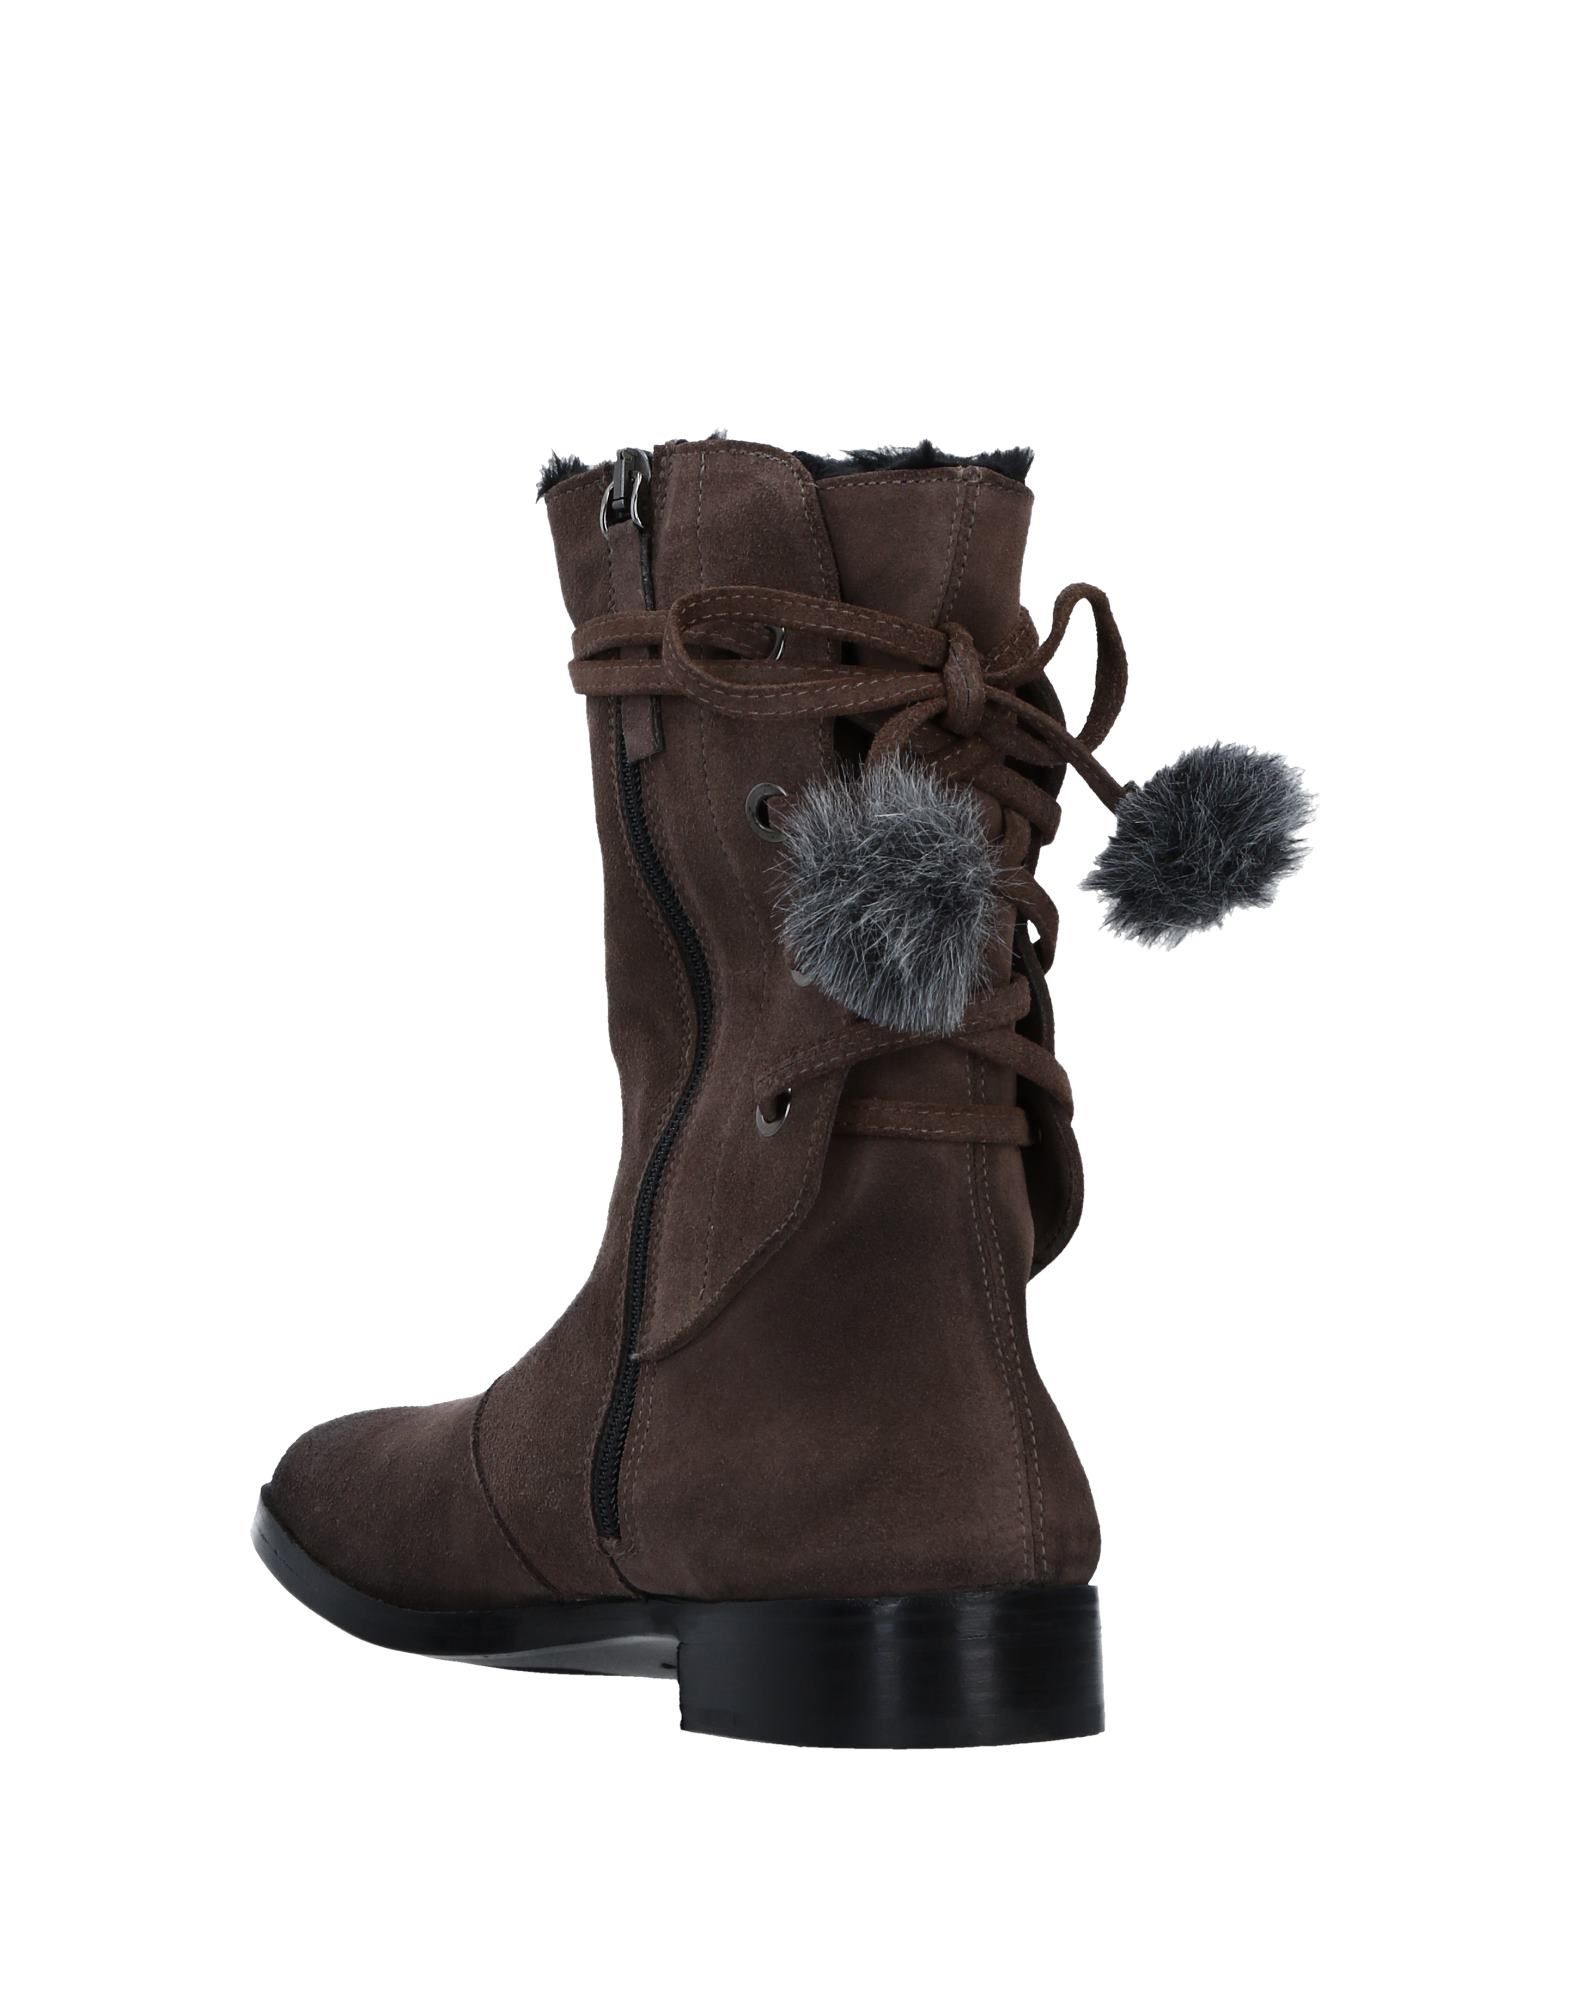 Kudetà Stiefelette Damen  11540028MOGut Schuhe aussehende strapazierfähige Schuhe 11540028MOGut d9589c